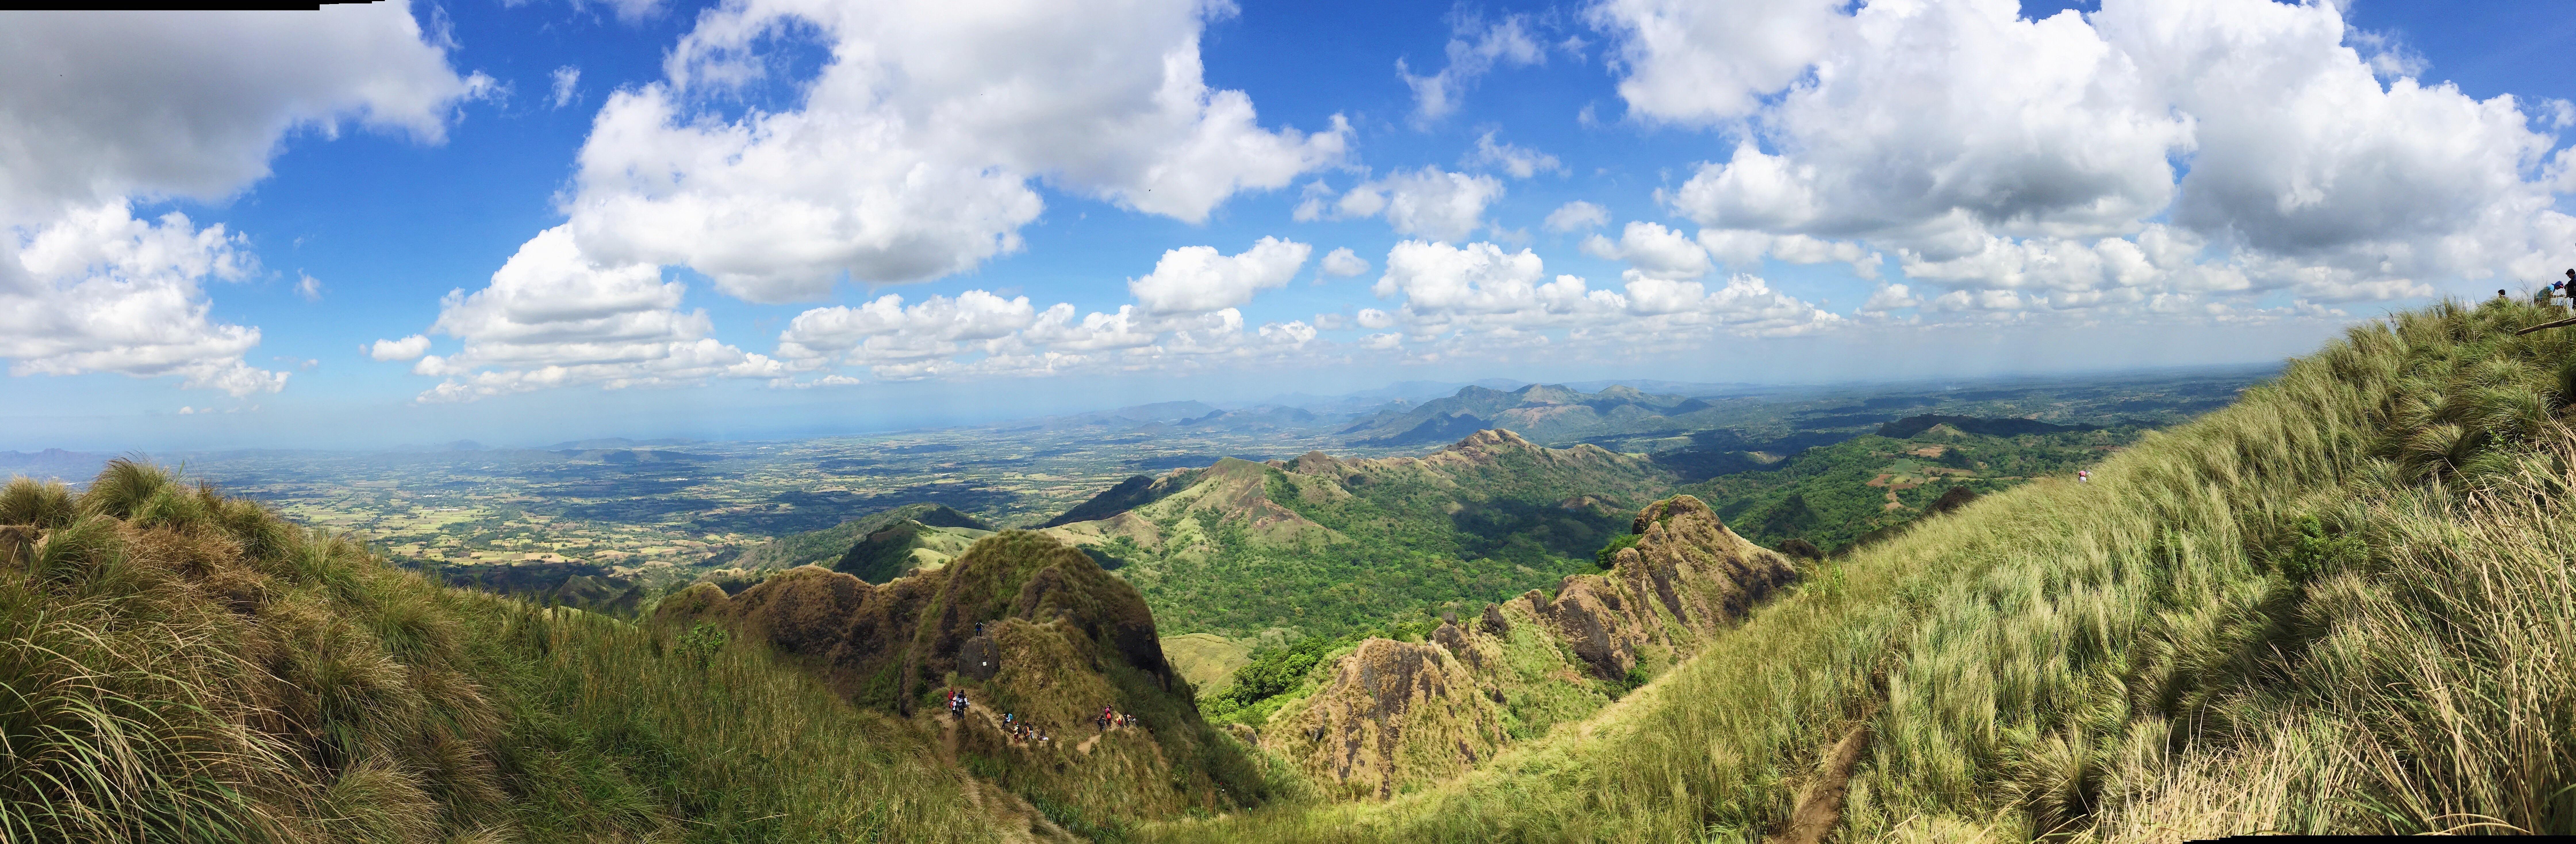 Outdoor Nature Mountains Mt Batulao In Nasugbu Batangas